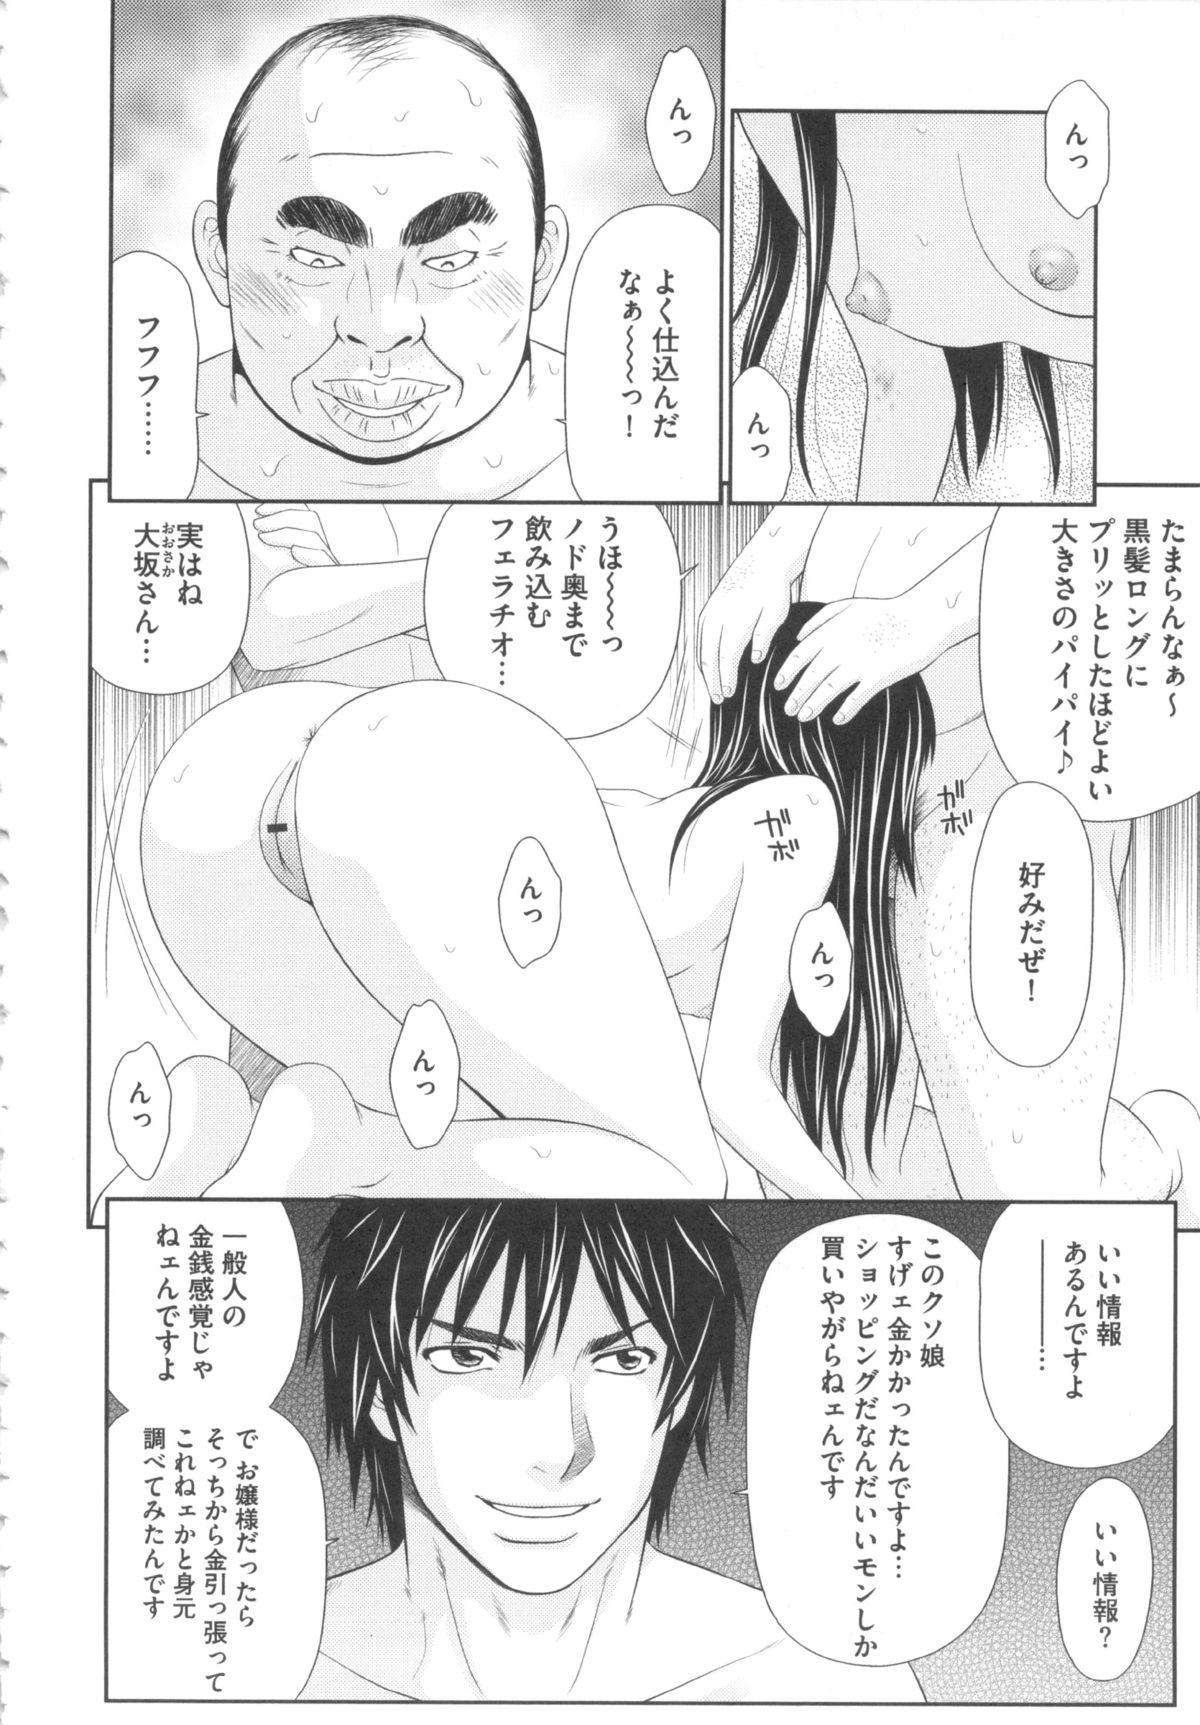 Kiseki No Zaajiru - Sperm of Miracle 188